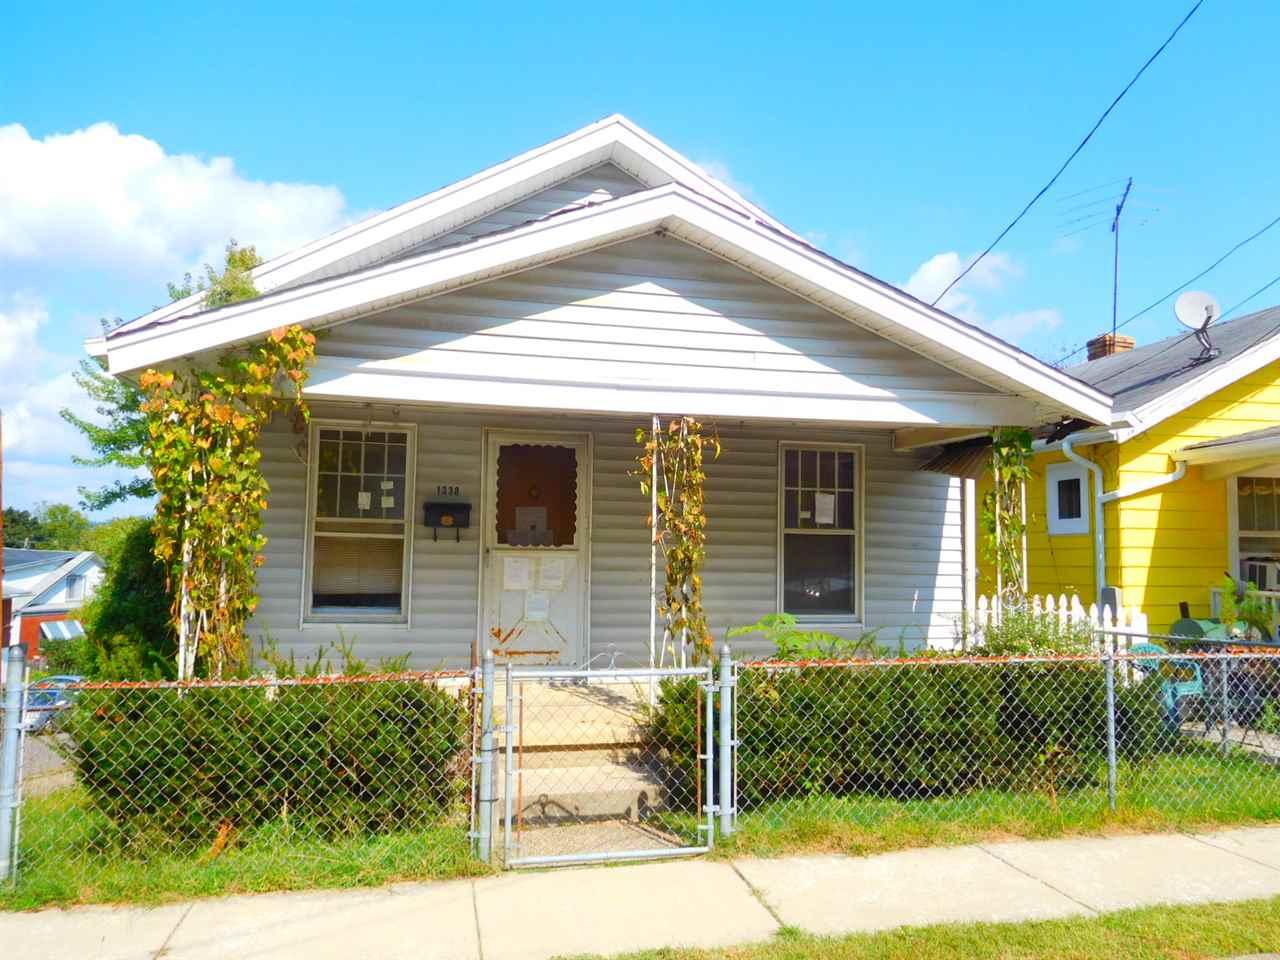 Photo of 1338 Hazen Street  Covington  KY